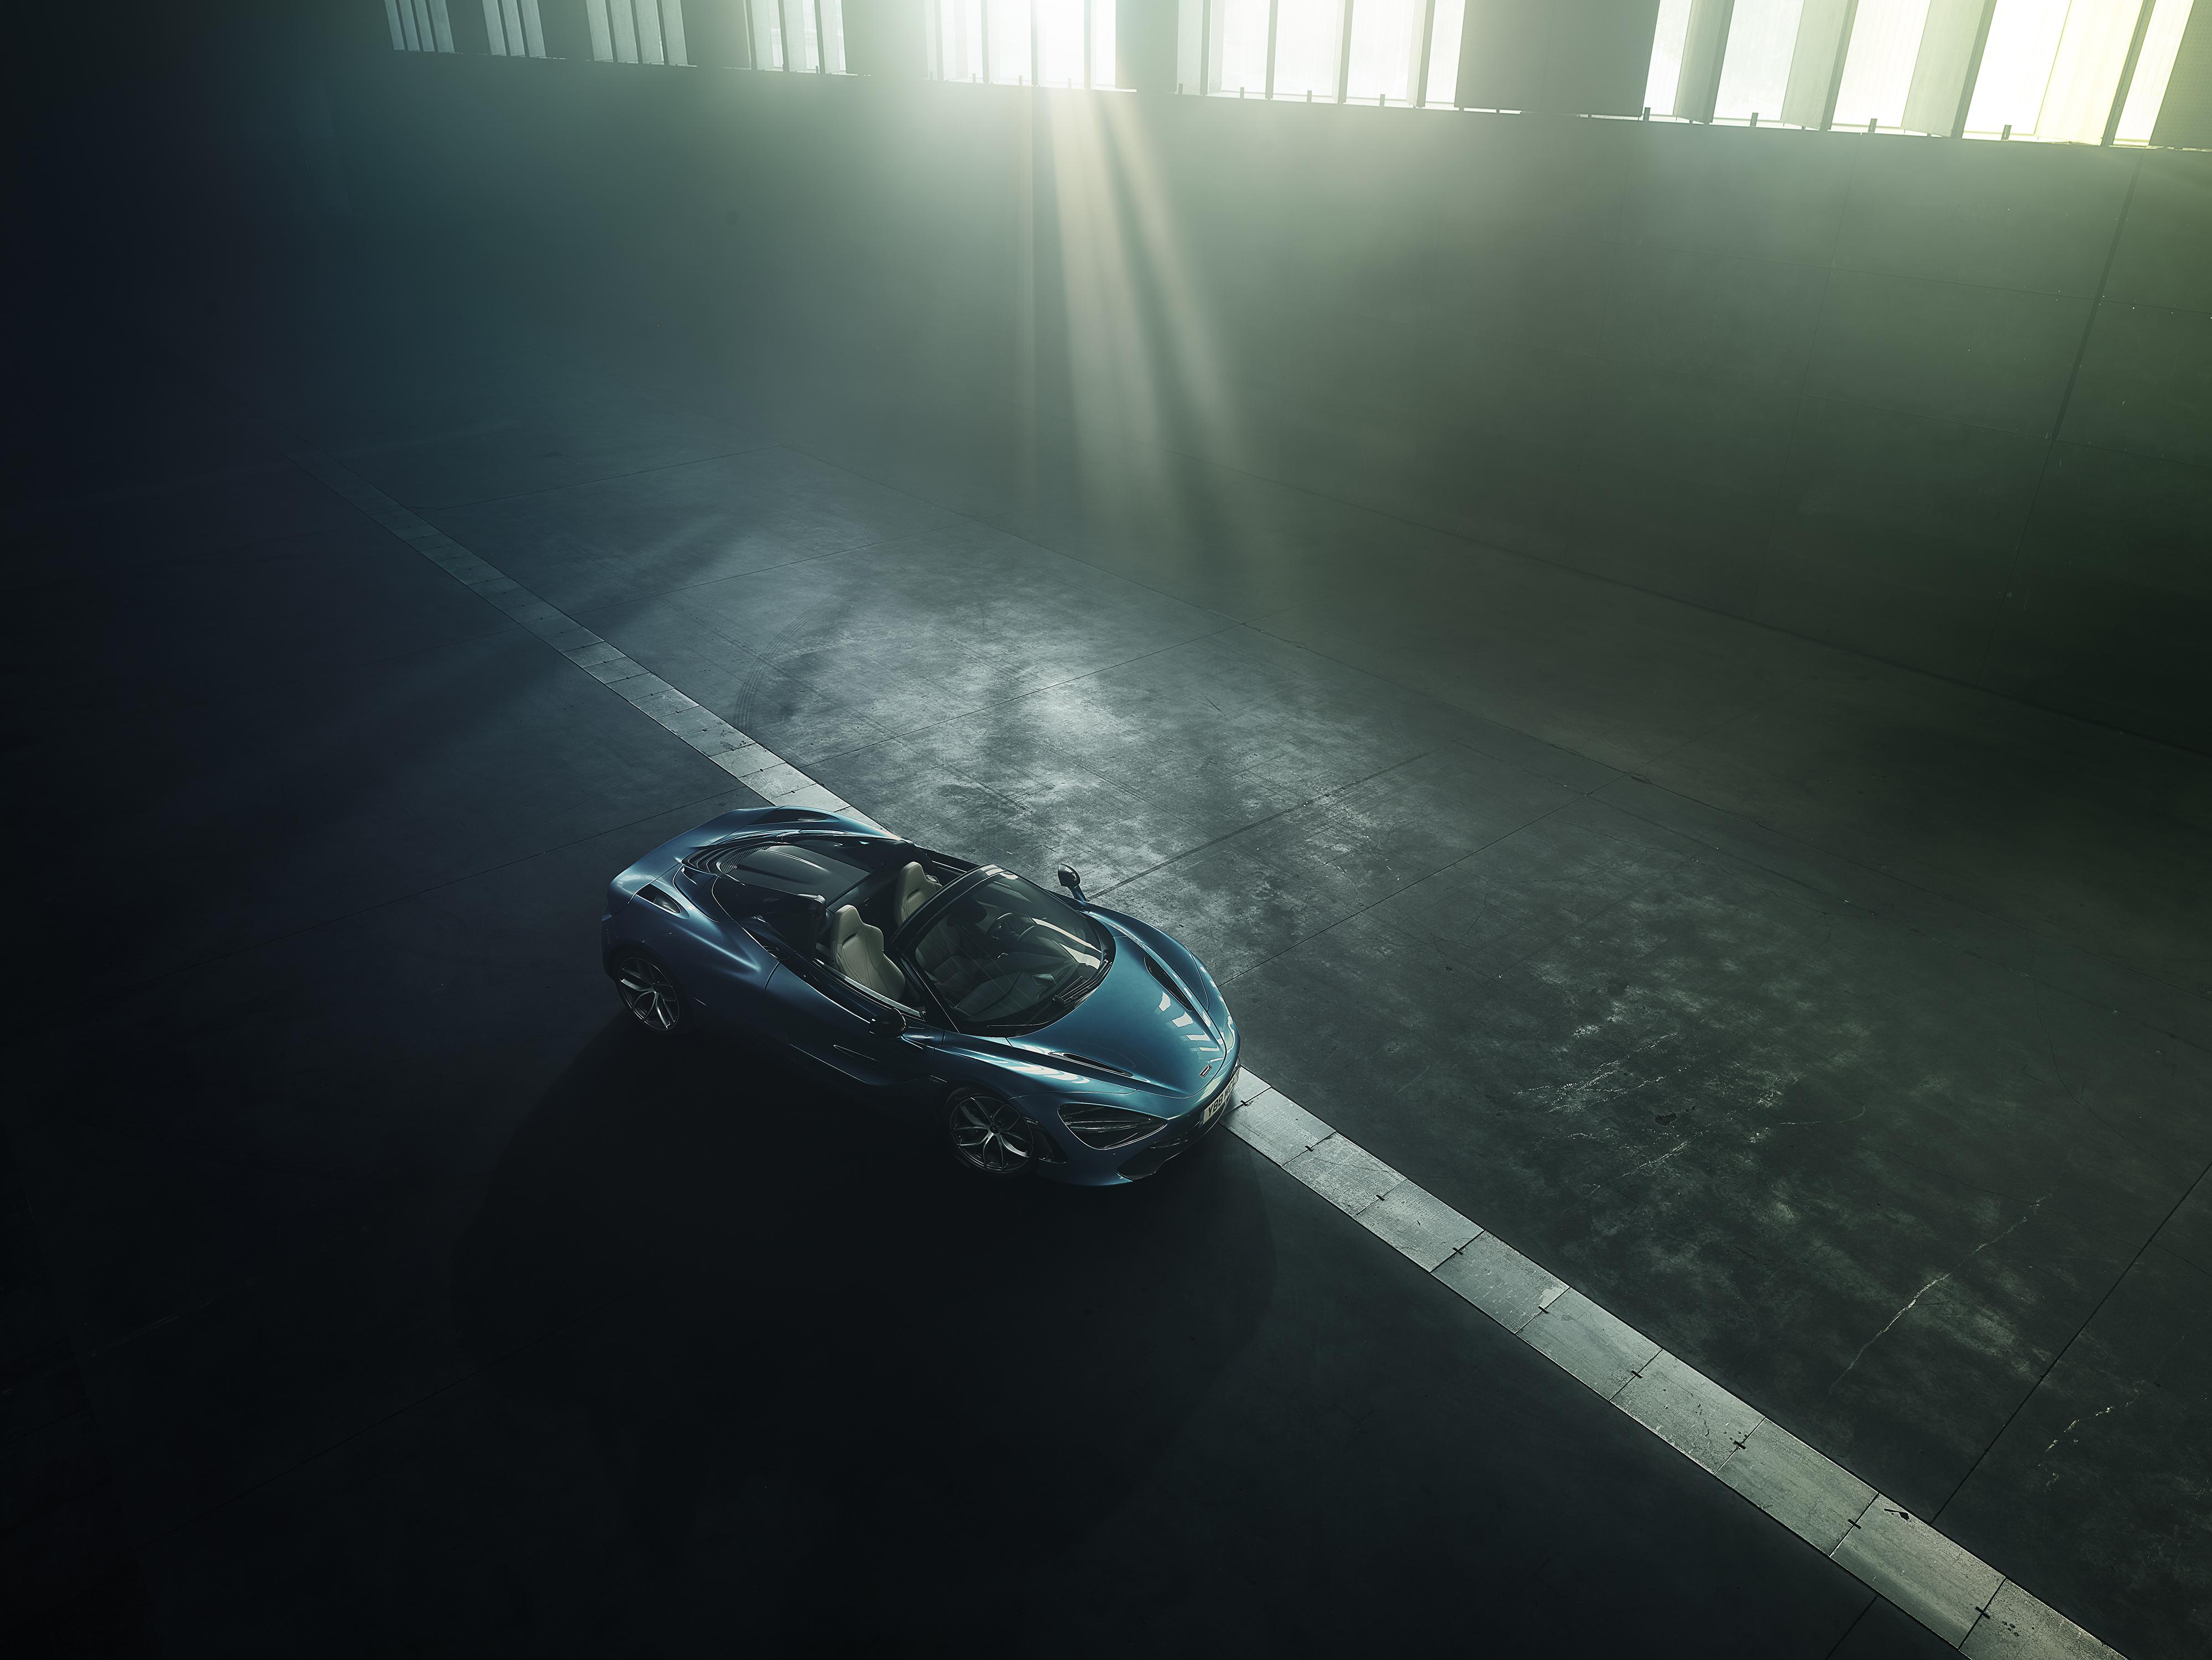 Blue Car Car Mclaren Mclaren 720s Sport Car Supercar Vehicle 4000x3001